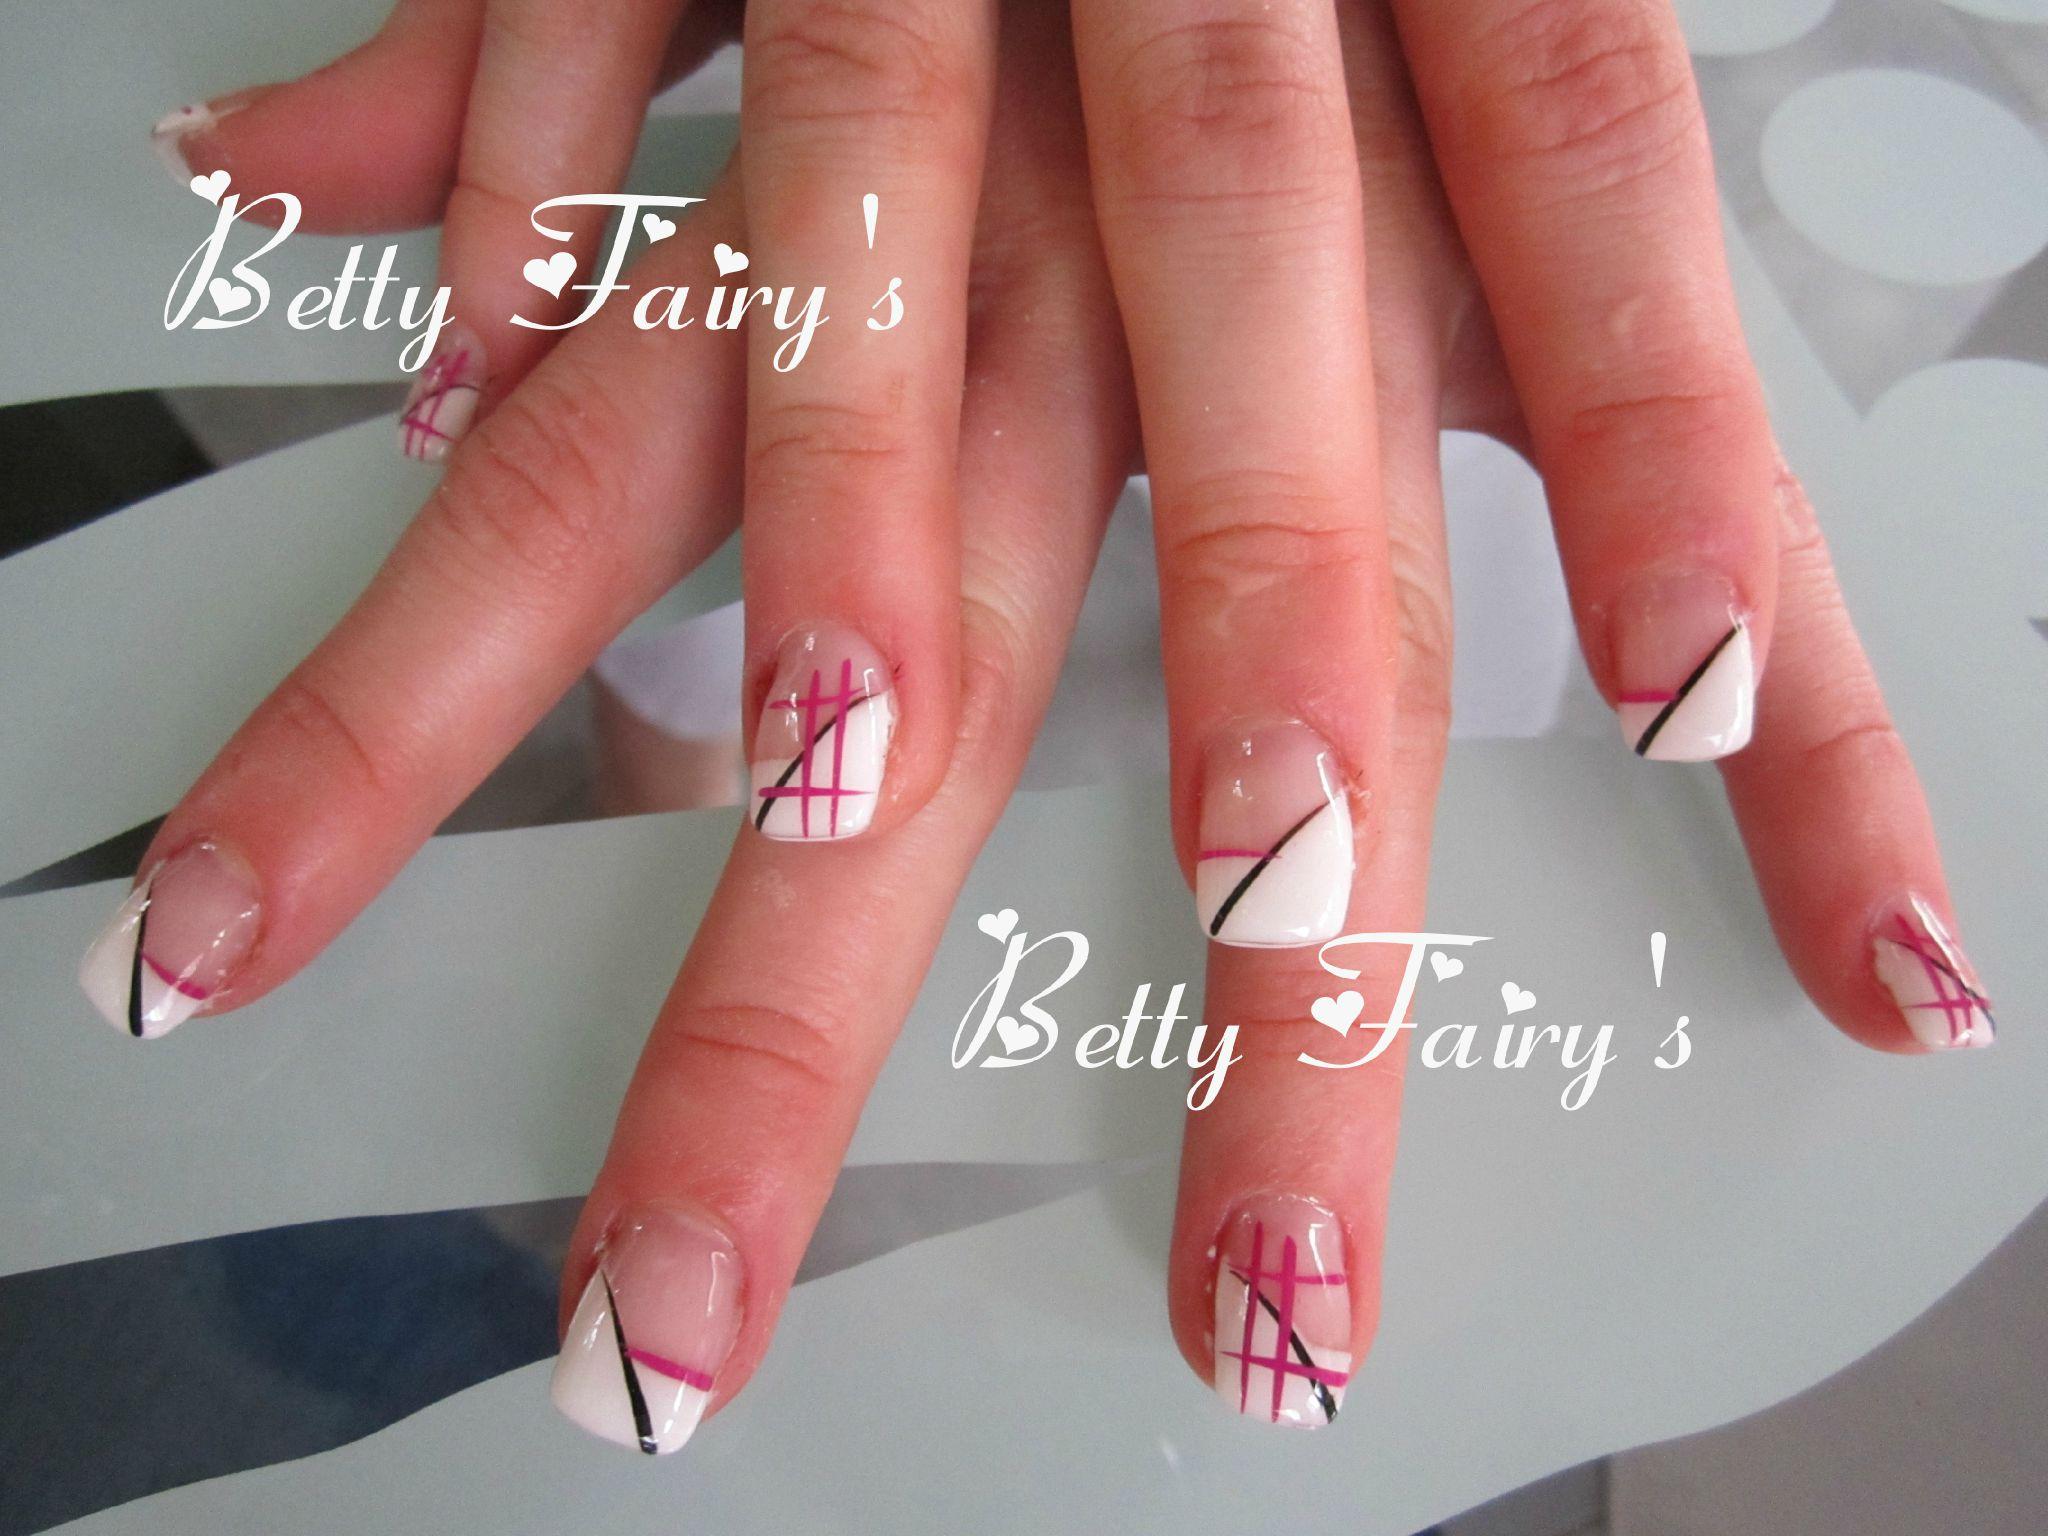 Originalit f erique jusqu 39 au bout des ongles - Ongle gel french blanche ...